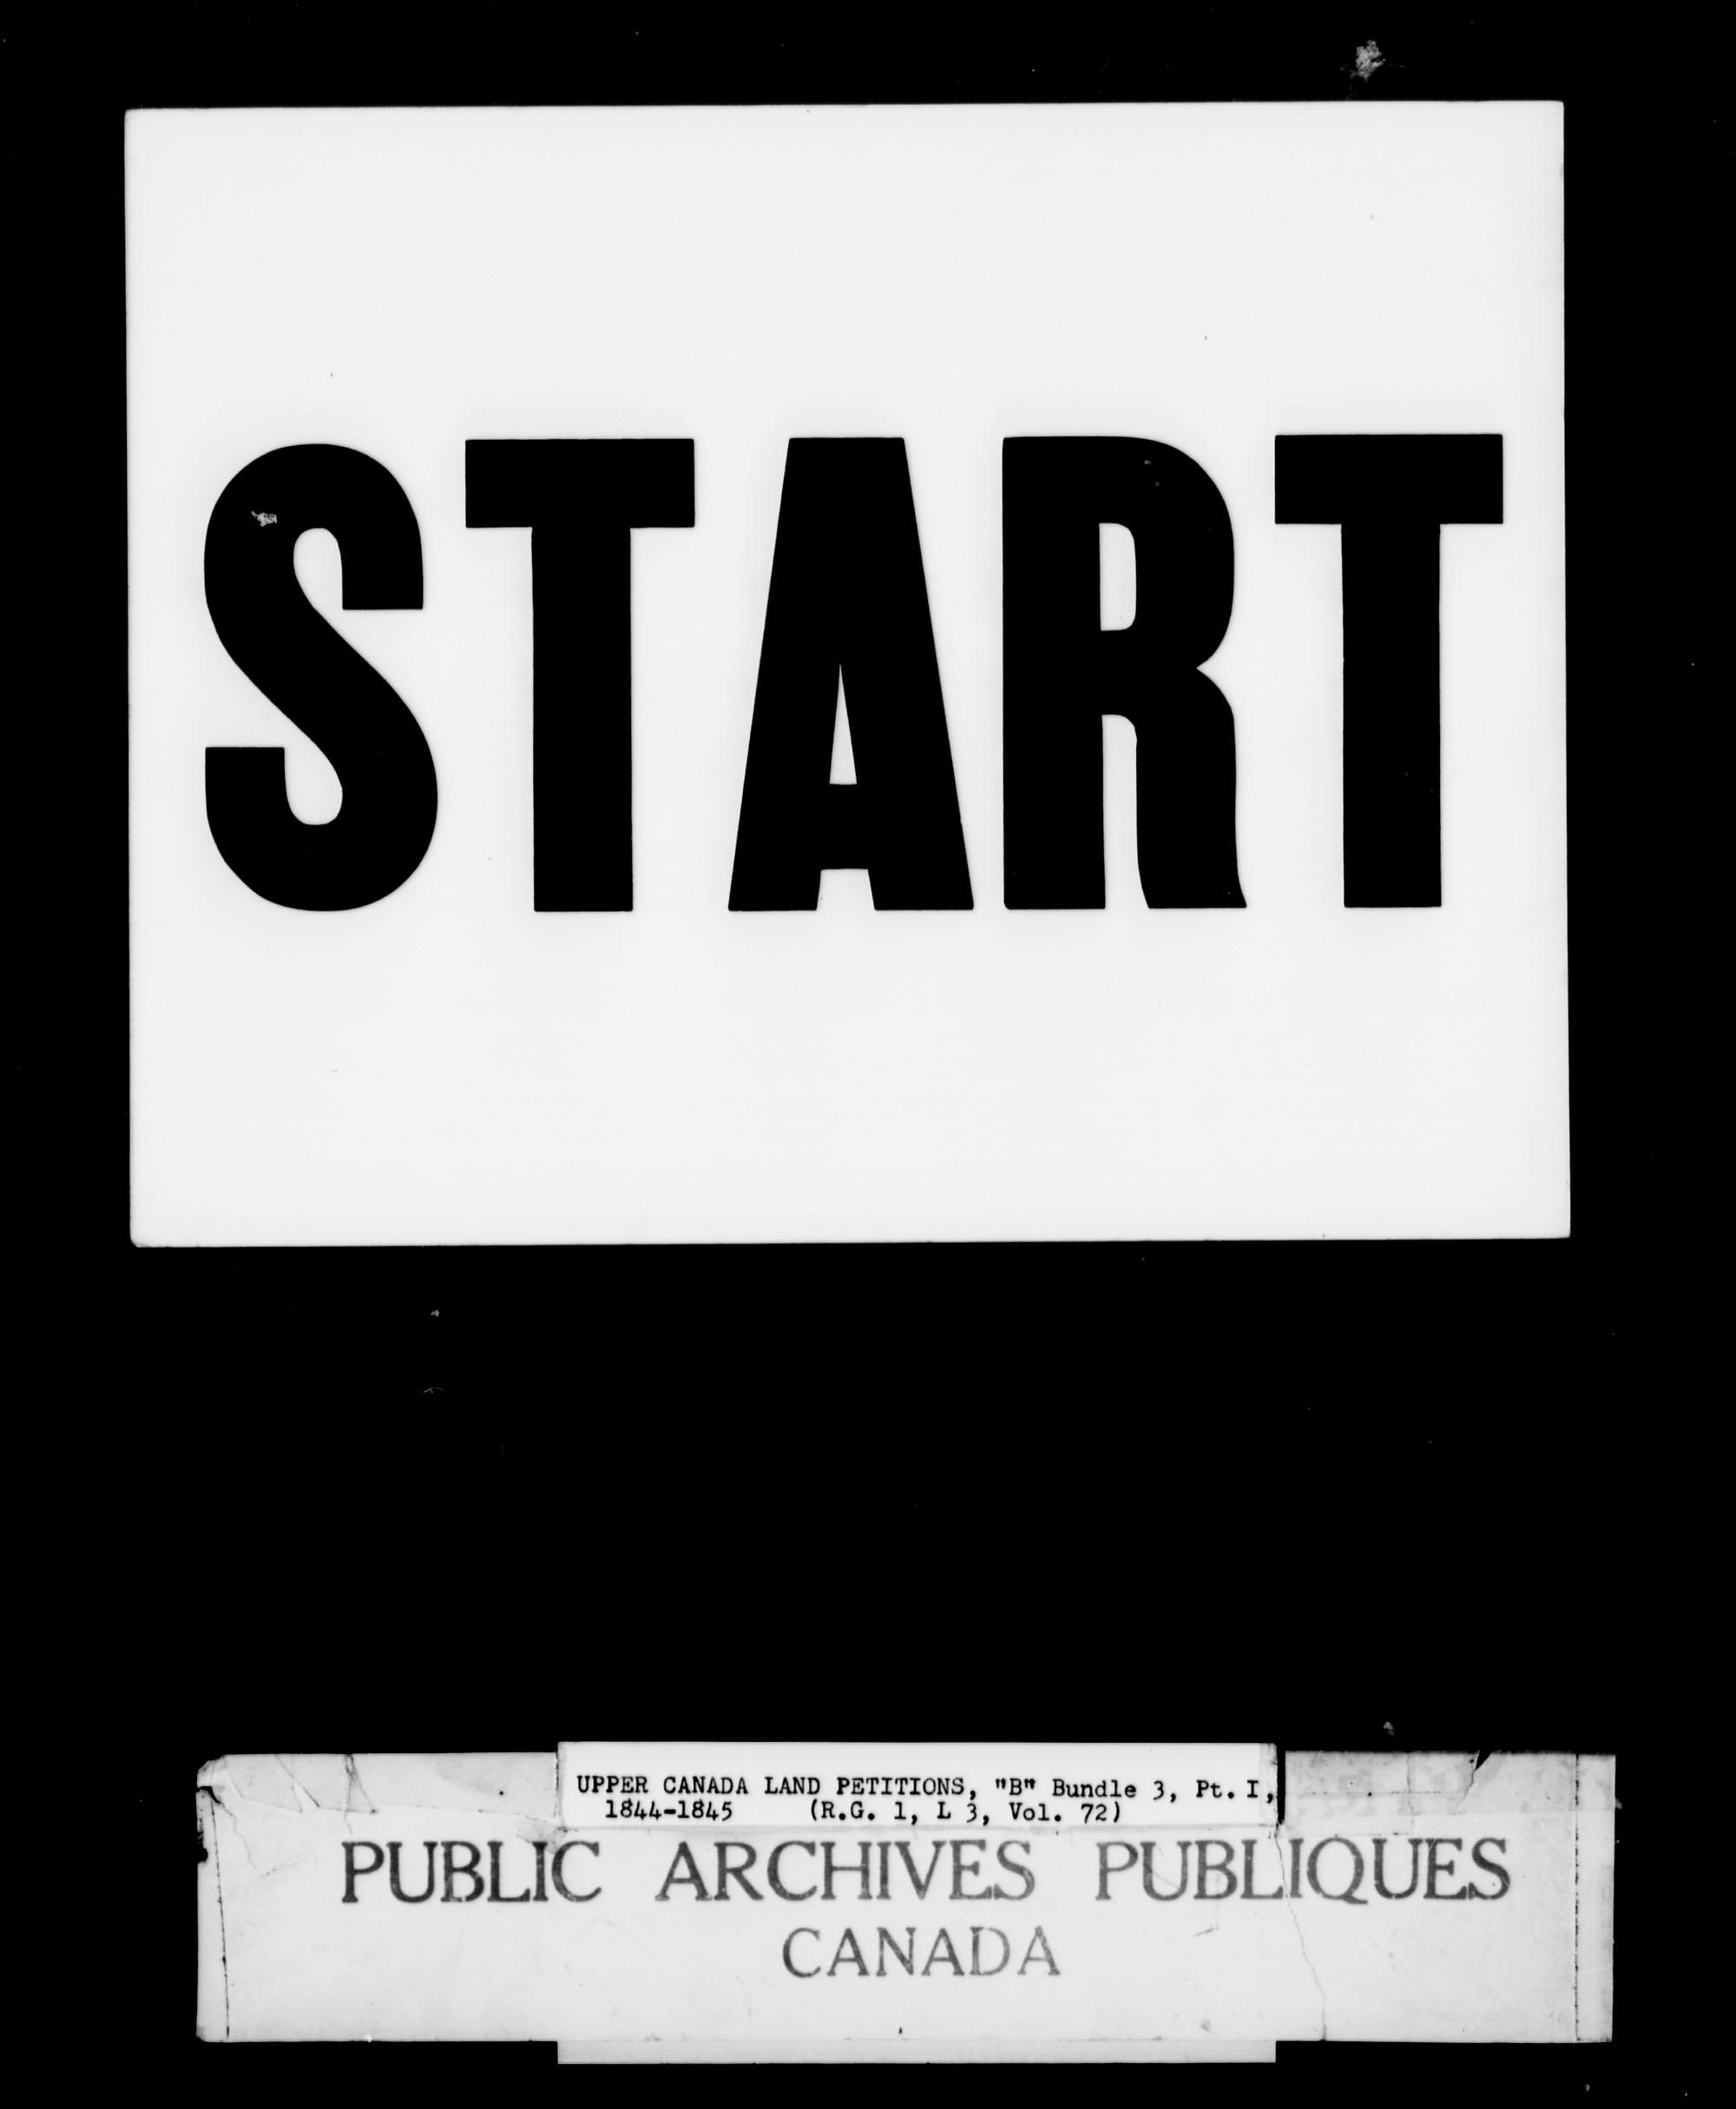 Titre: Demandes de terres du Haut-Canada (1763-1865) - N° d'enregistrement Mikan: 205131 - Microforme: c-1638